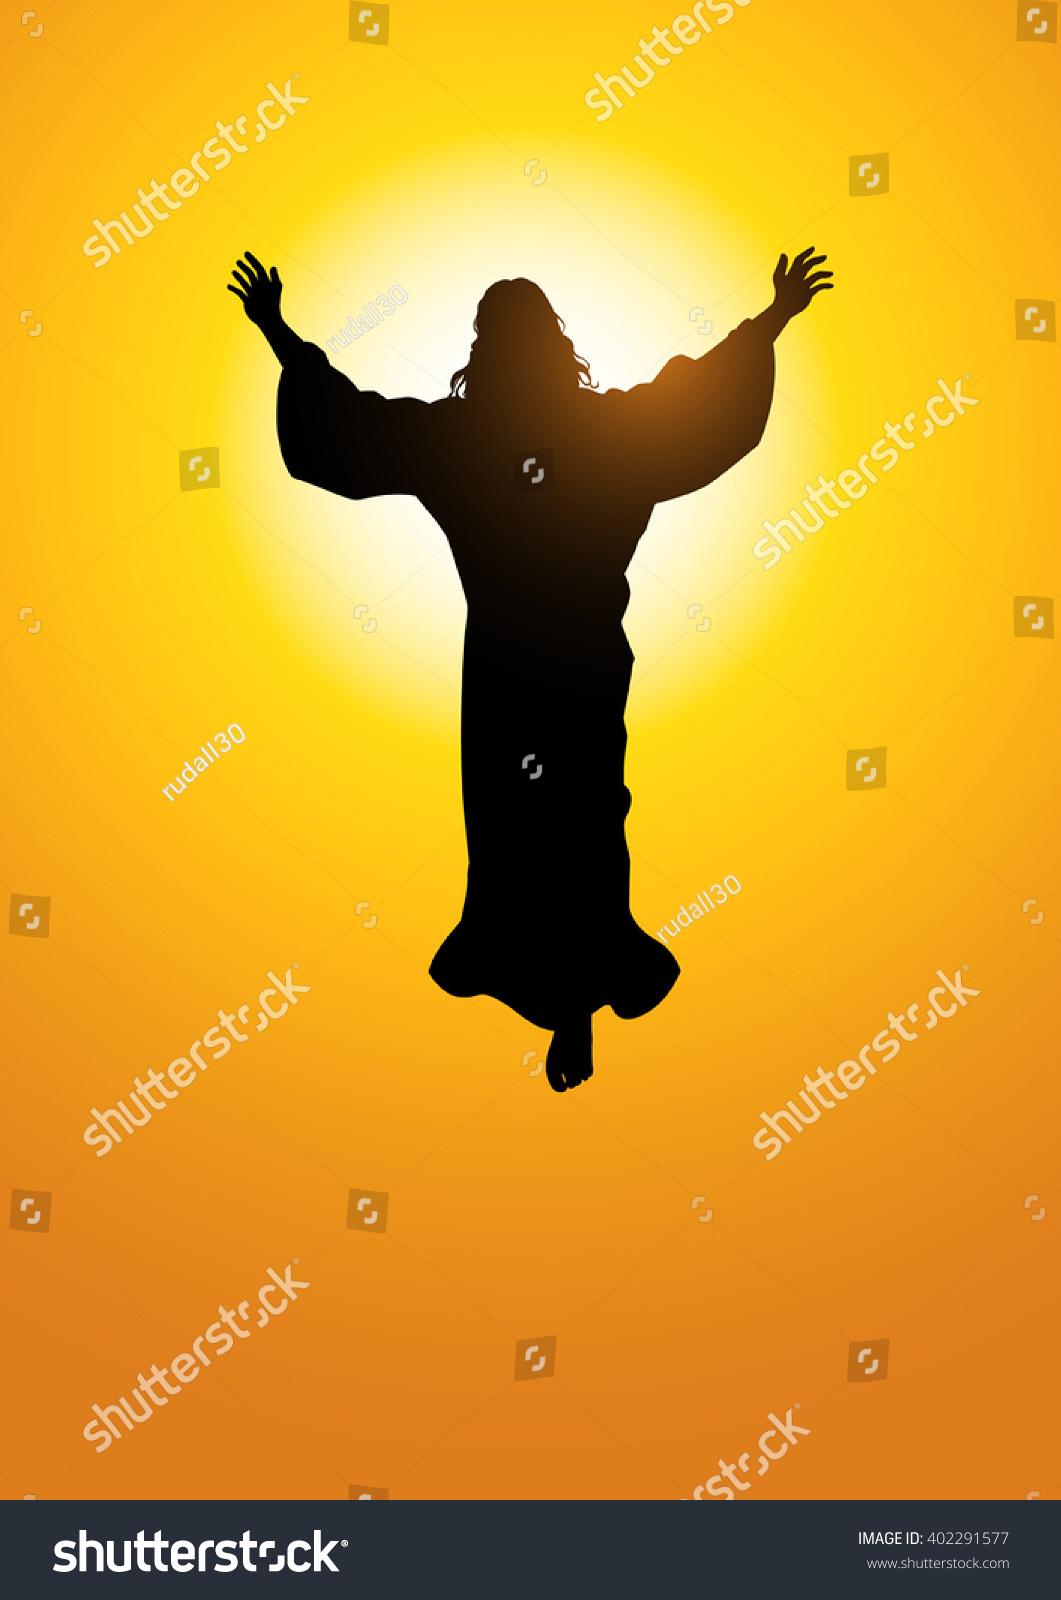 Silhouette Illustration Ascension Jesus Christ Stock ...